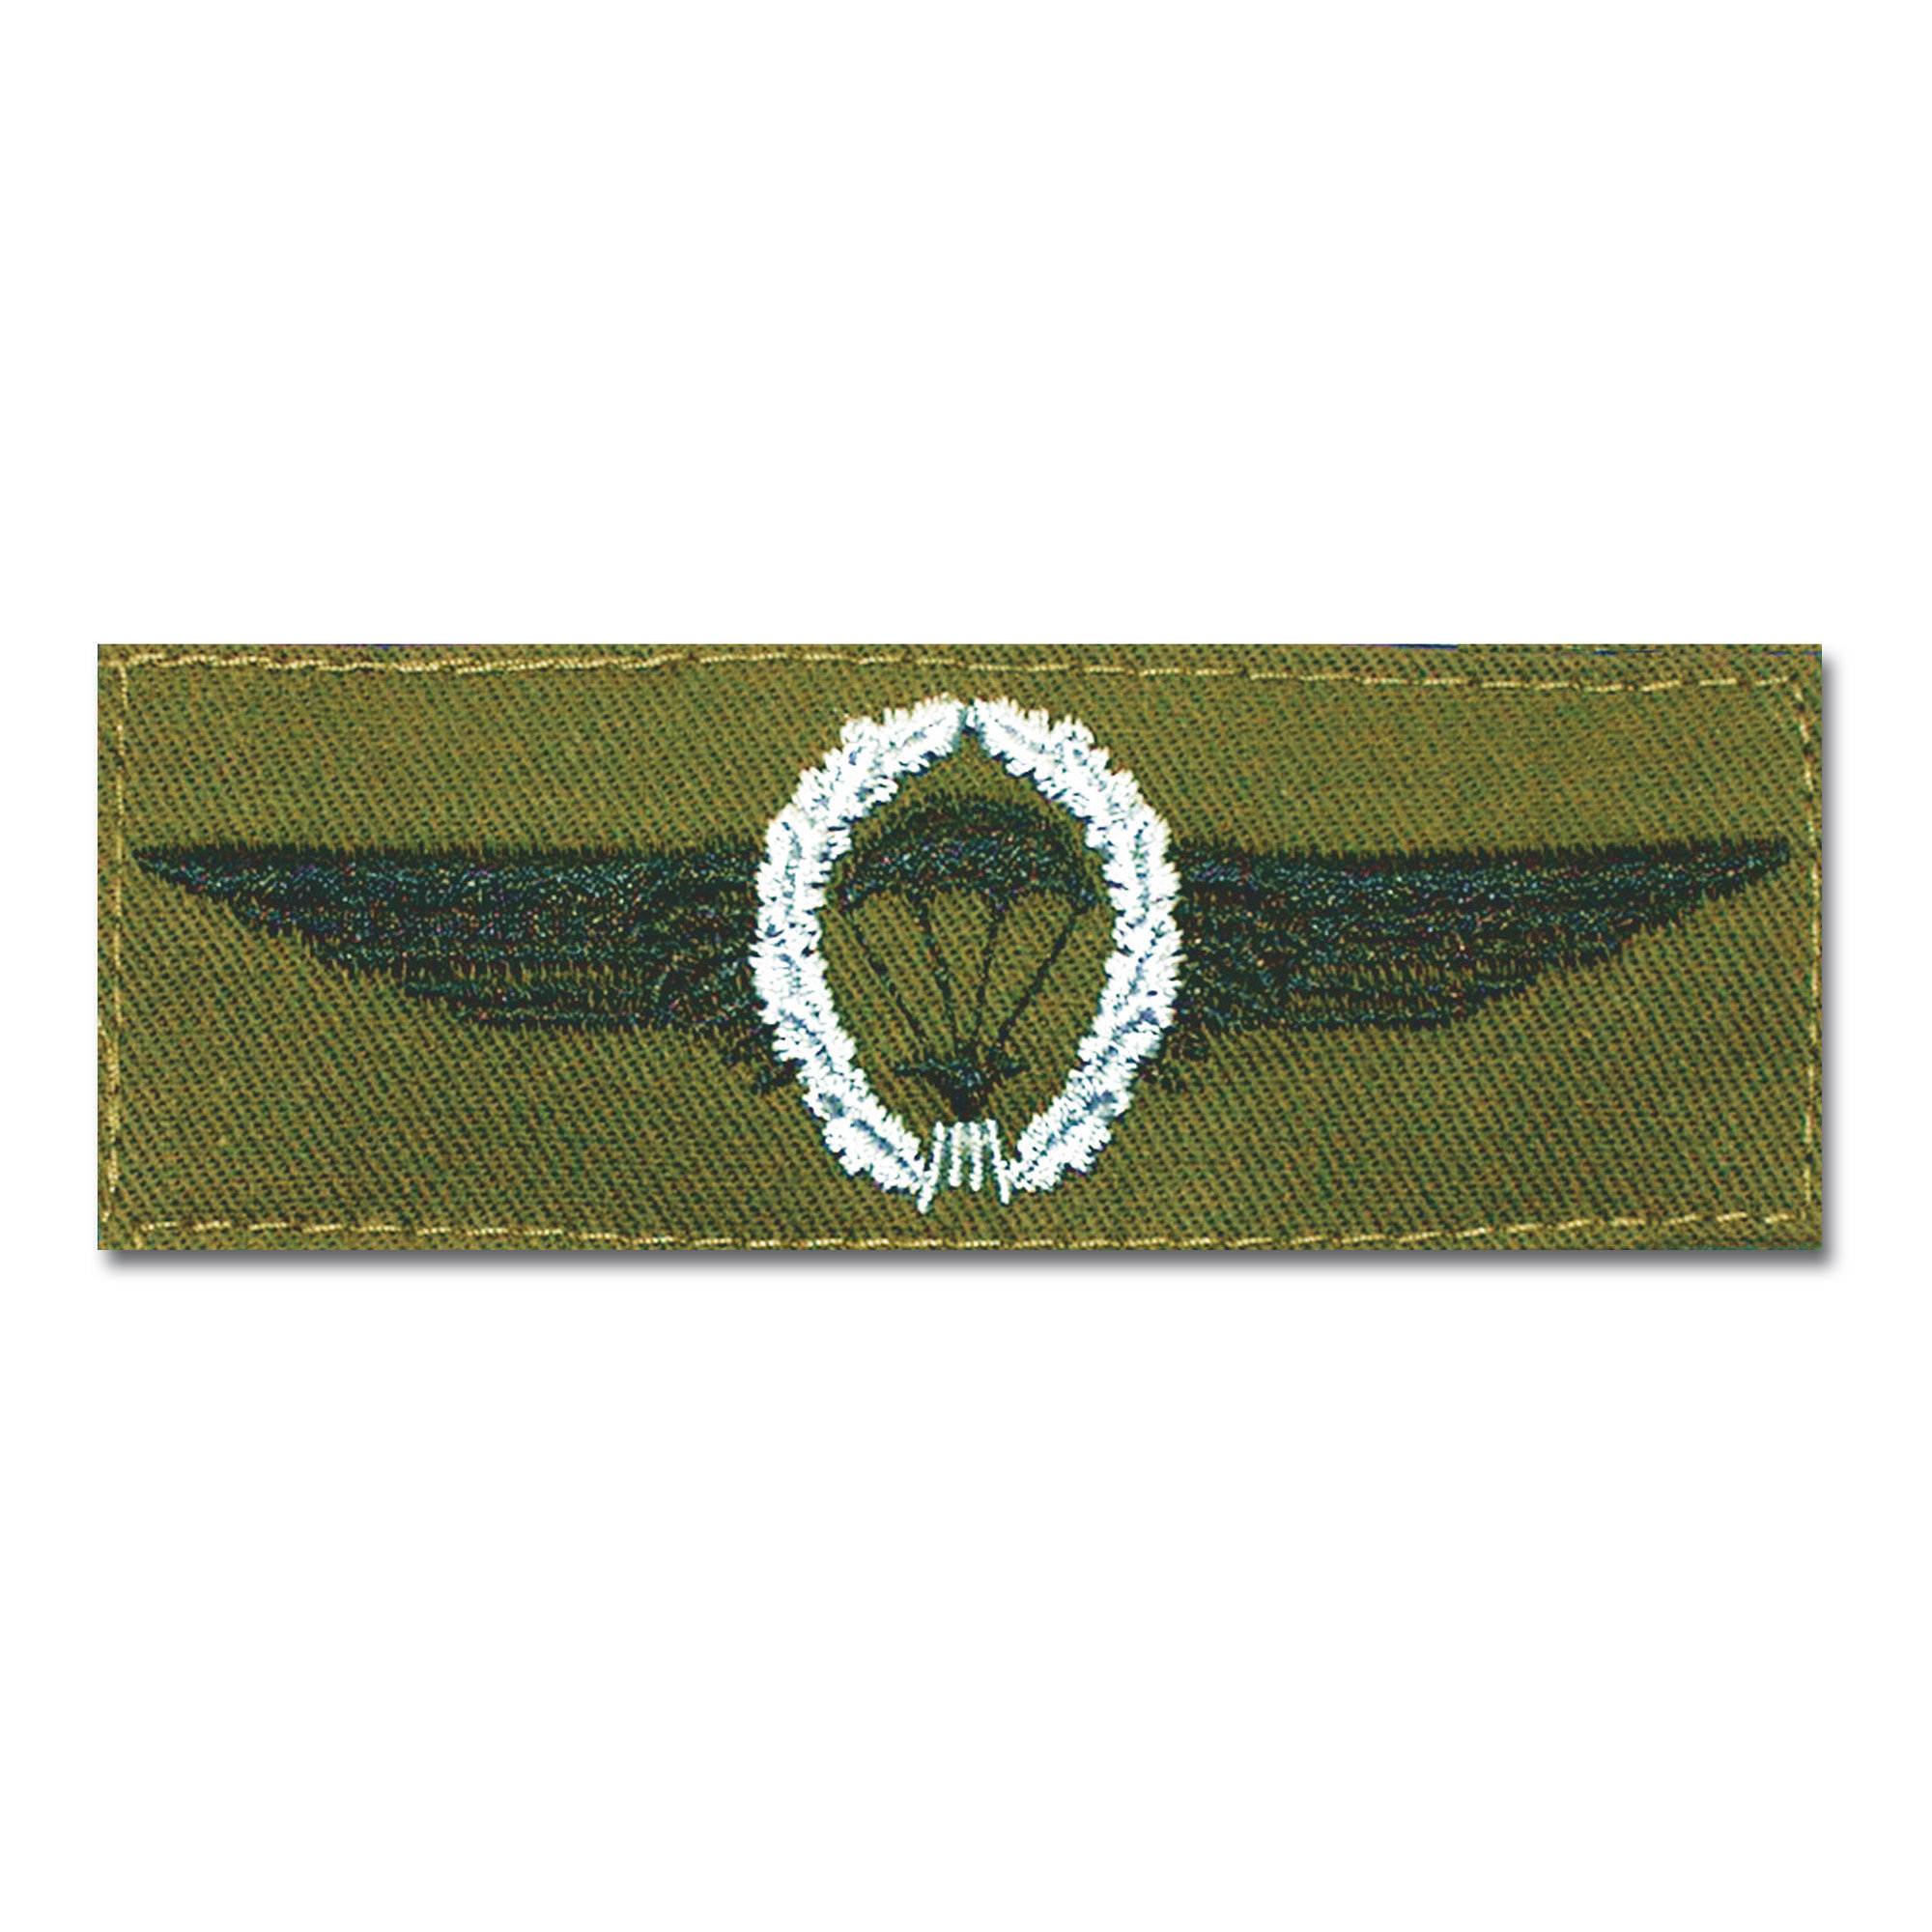 Insigne Fallschirmspringer BW argent/vert olive